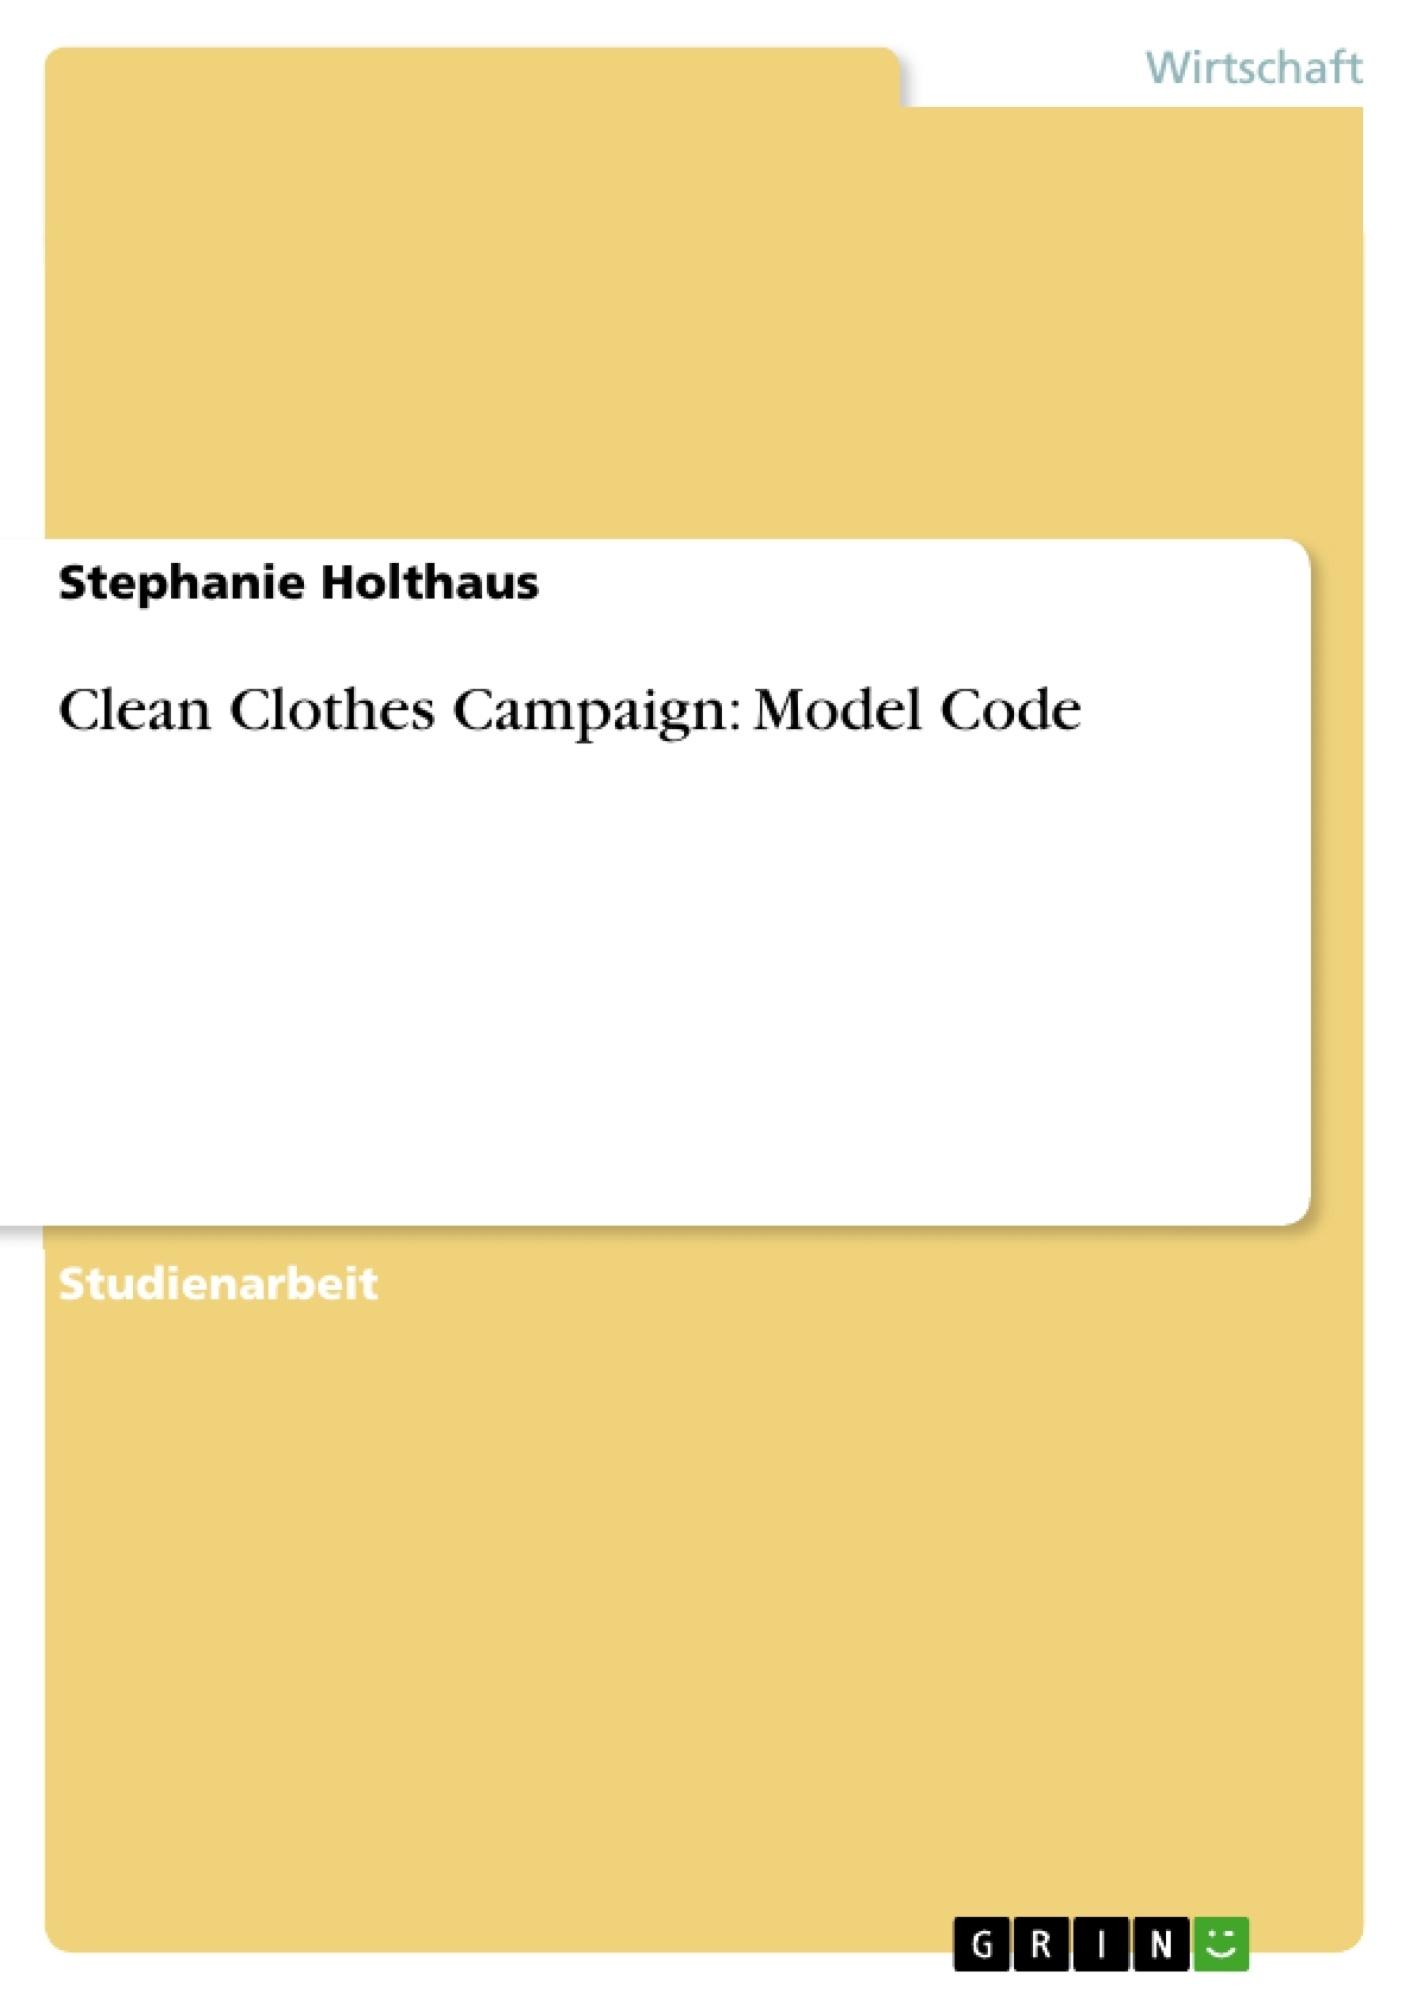 Titel: Clean Clothes Campaign: Model Code